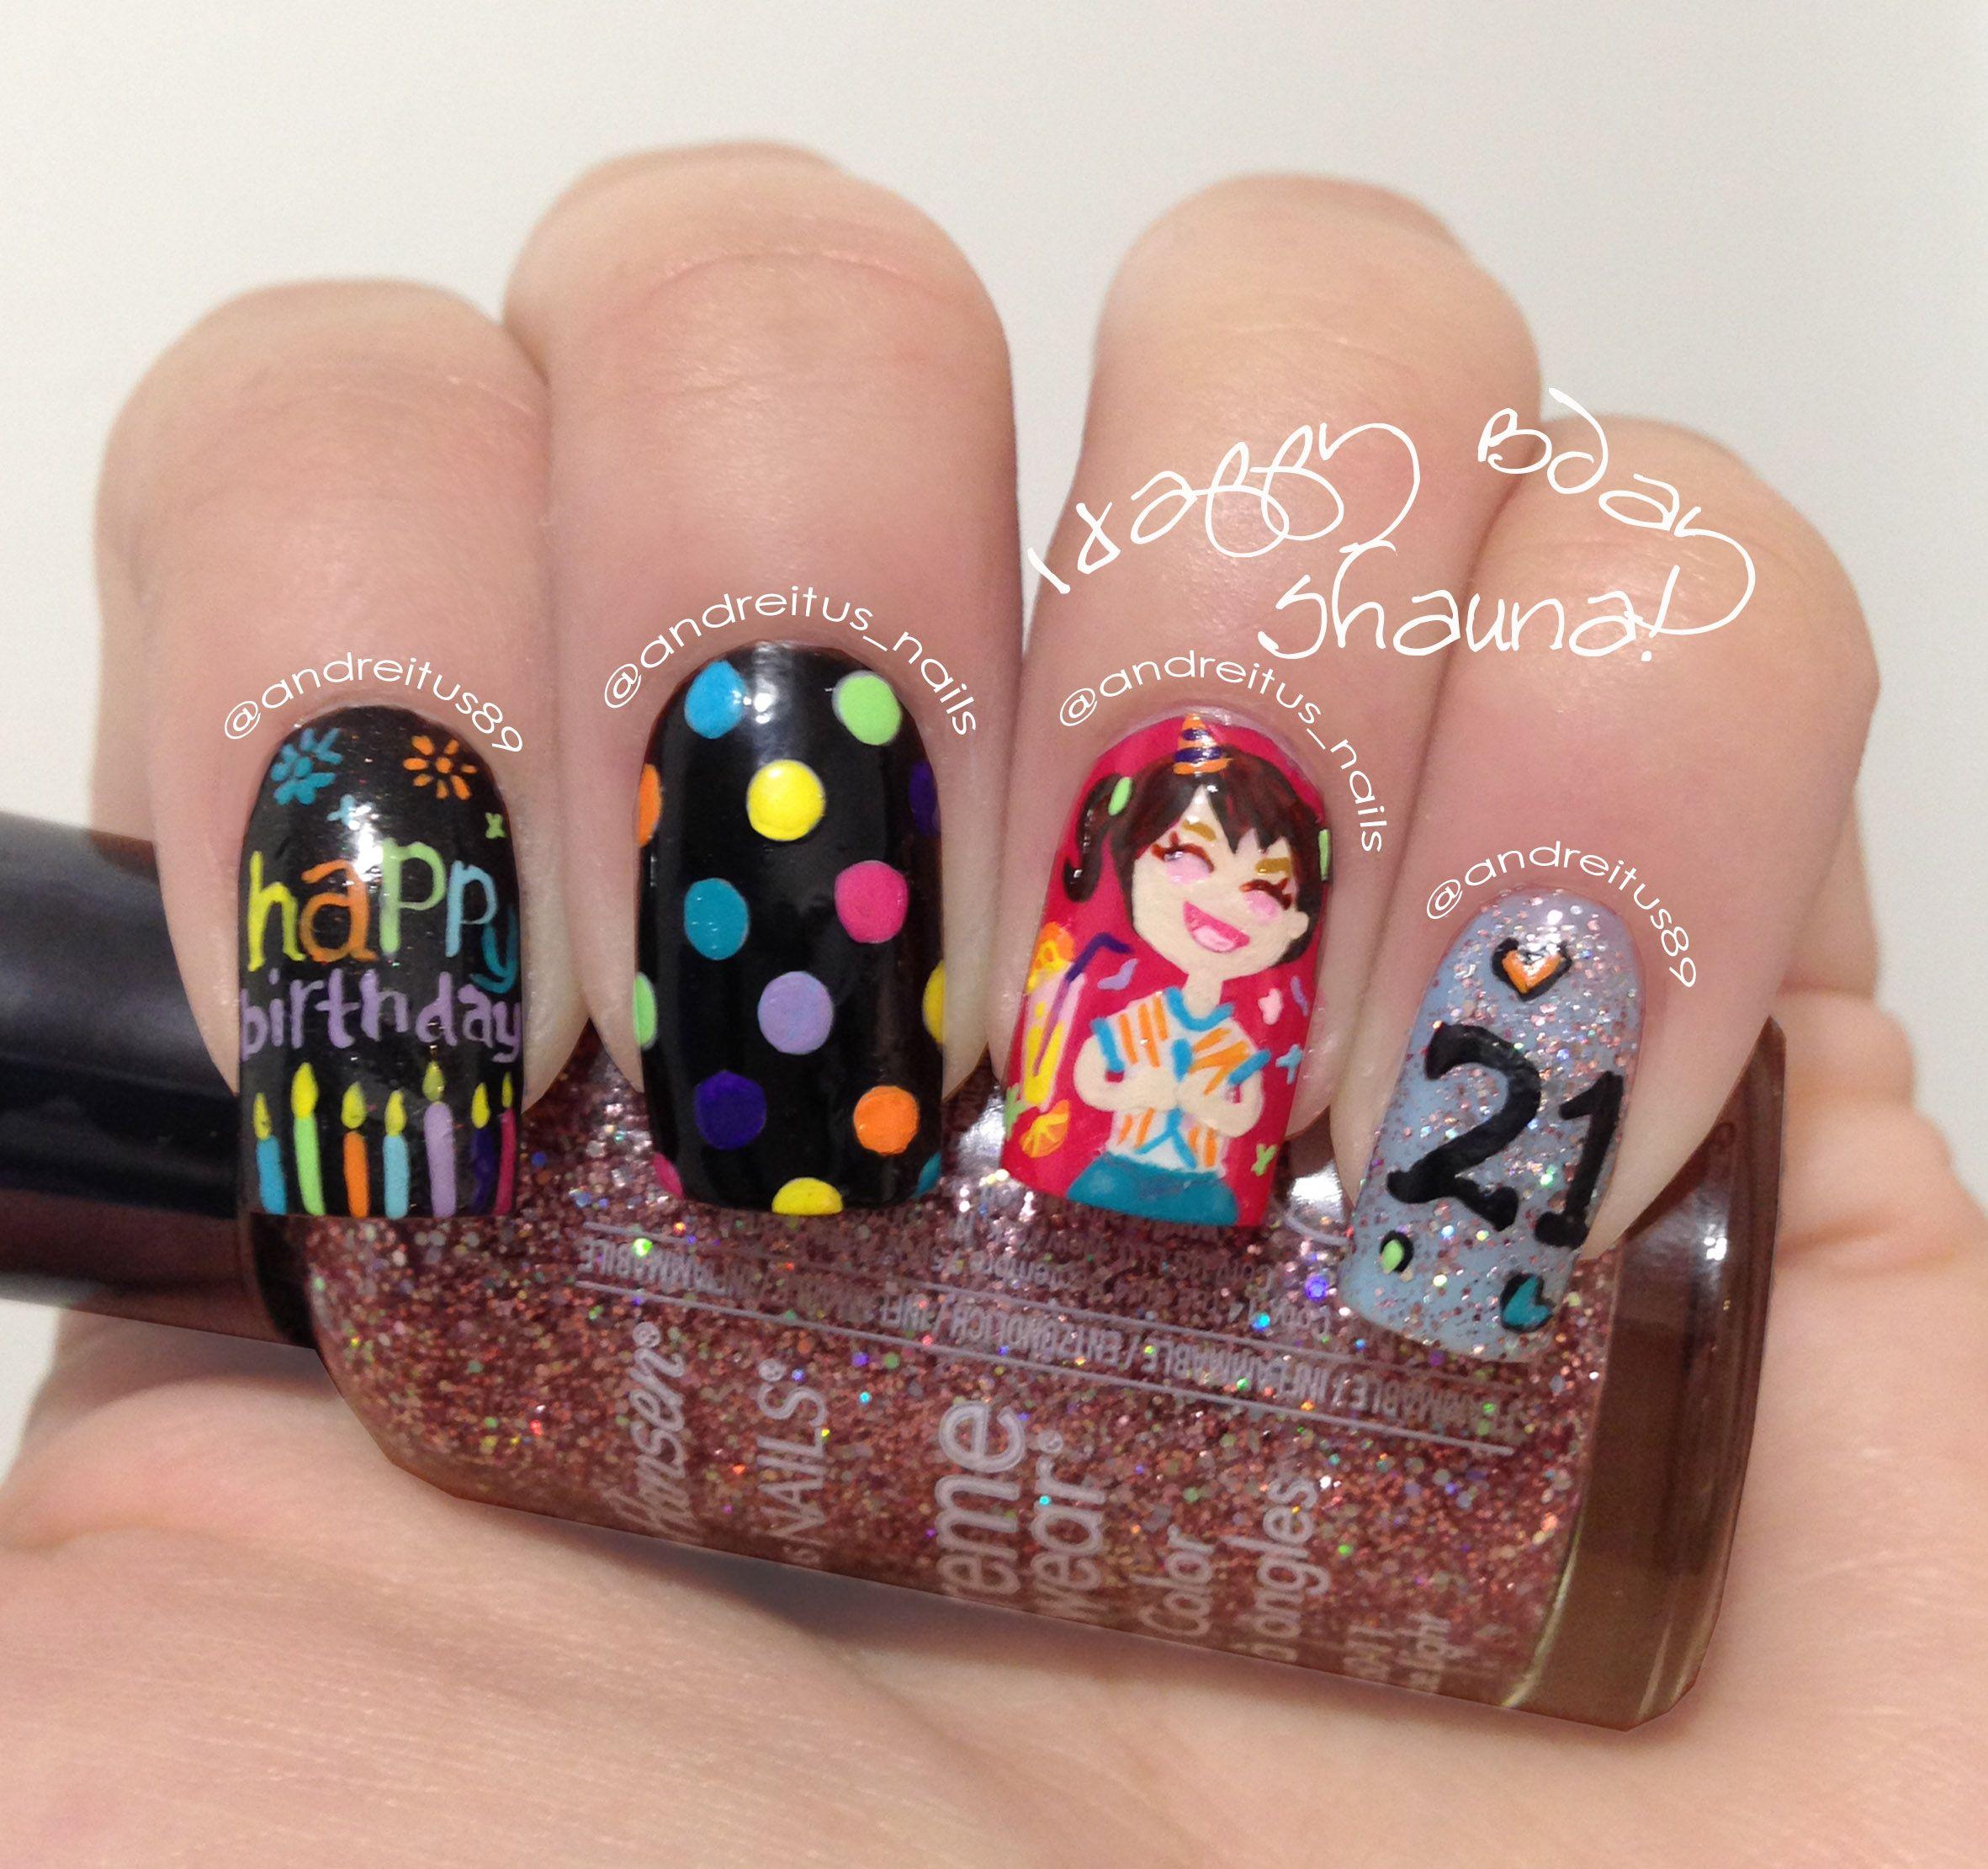 21 birthday nails Nail art NOTD Nails Pinterest 21st